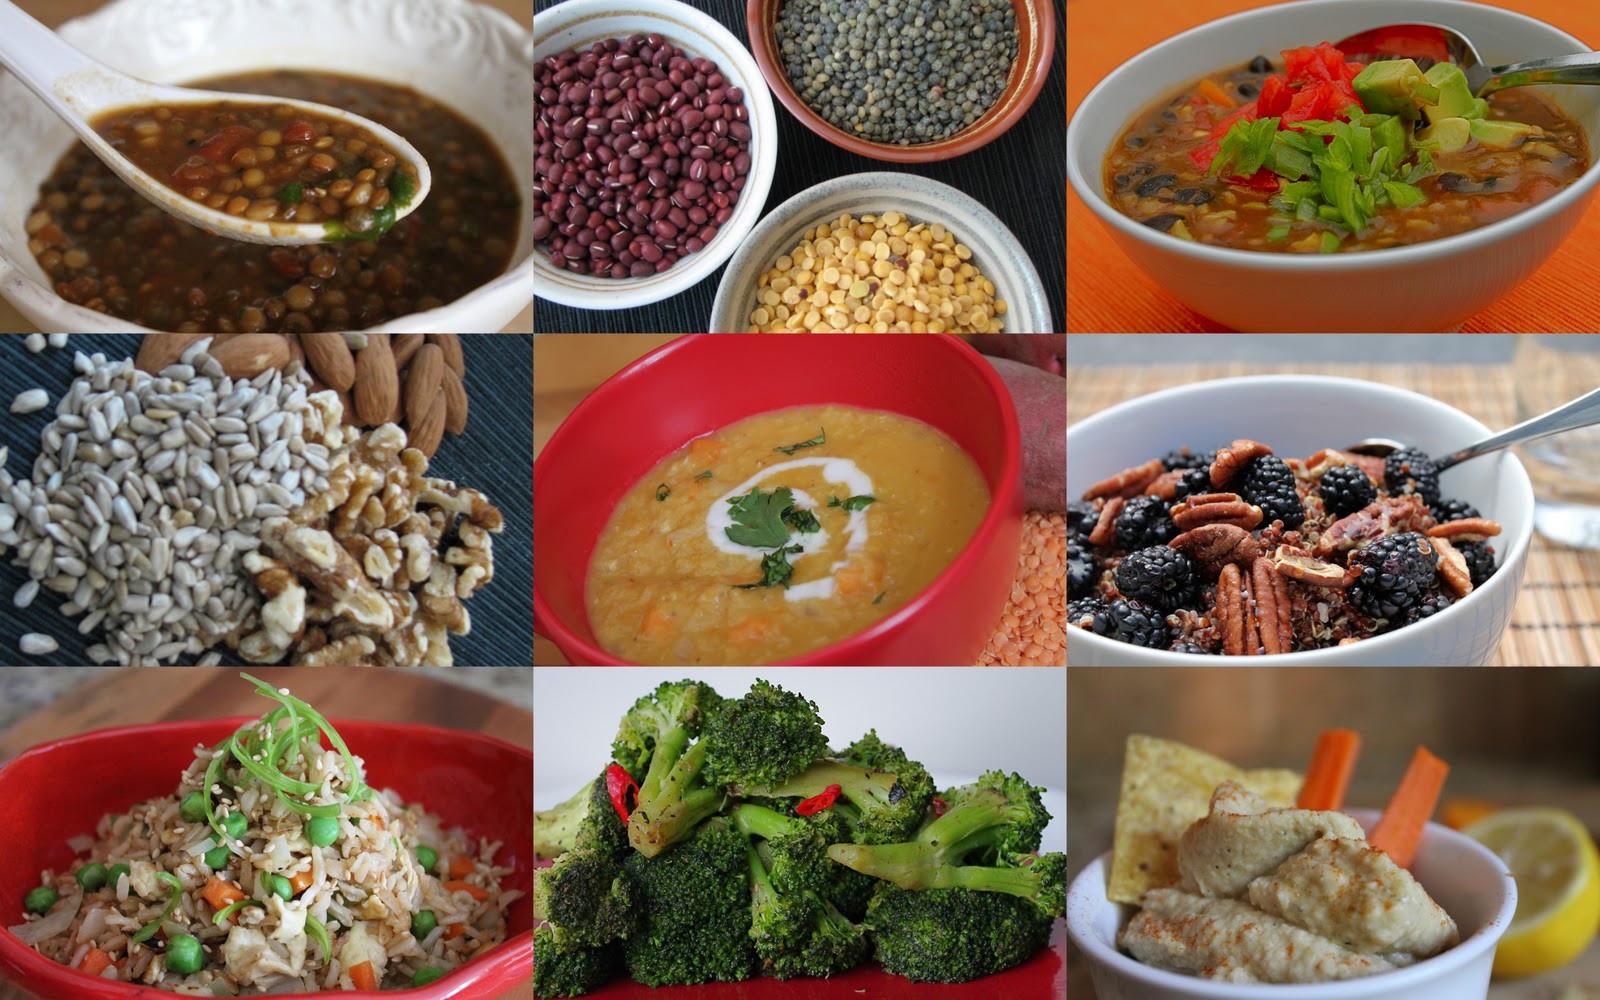 High Fiber Diet Recipes  8 Ways To Add Fiber to Your Diet A Smoky Black Bean Dip